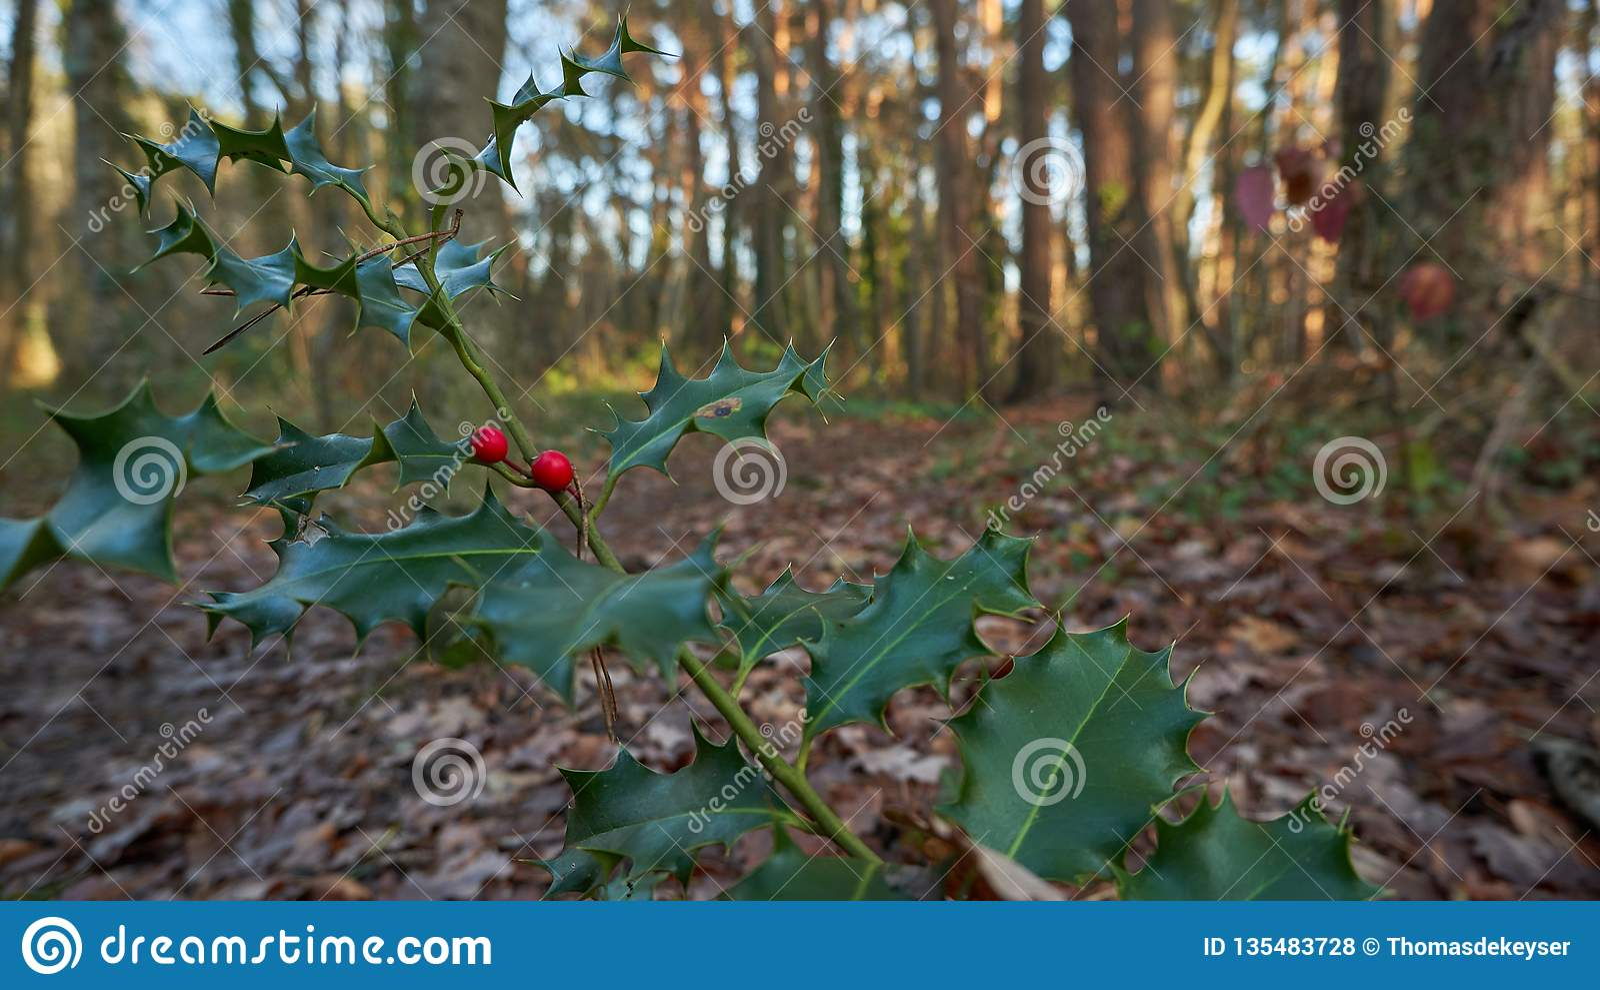 European holly in autumn